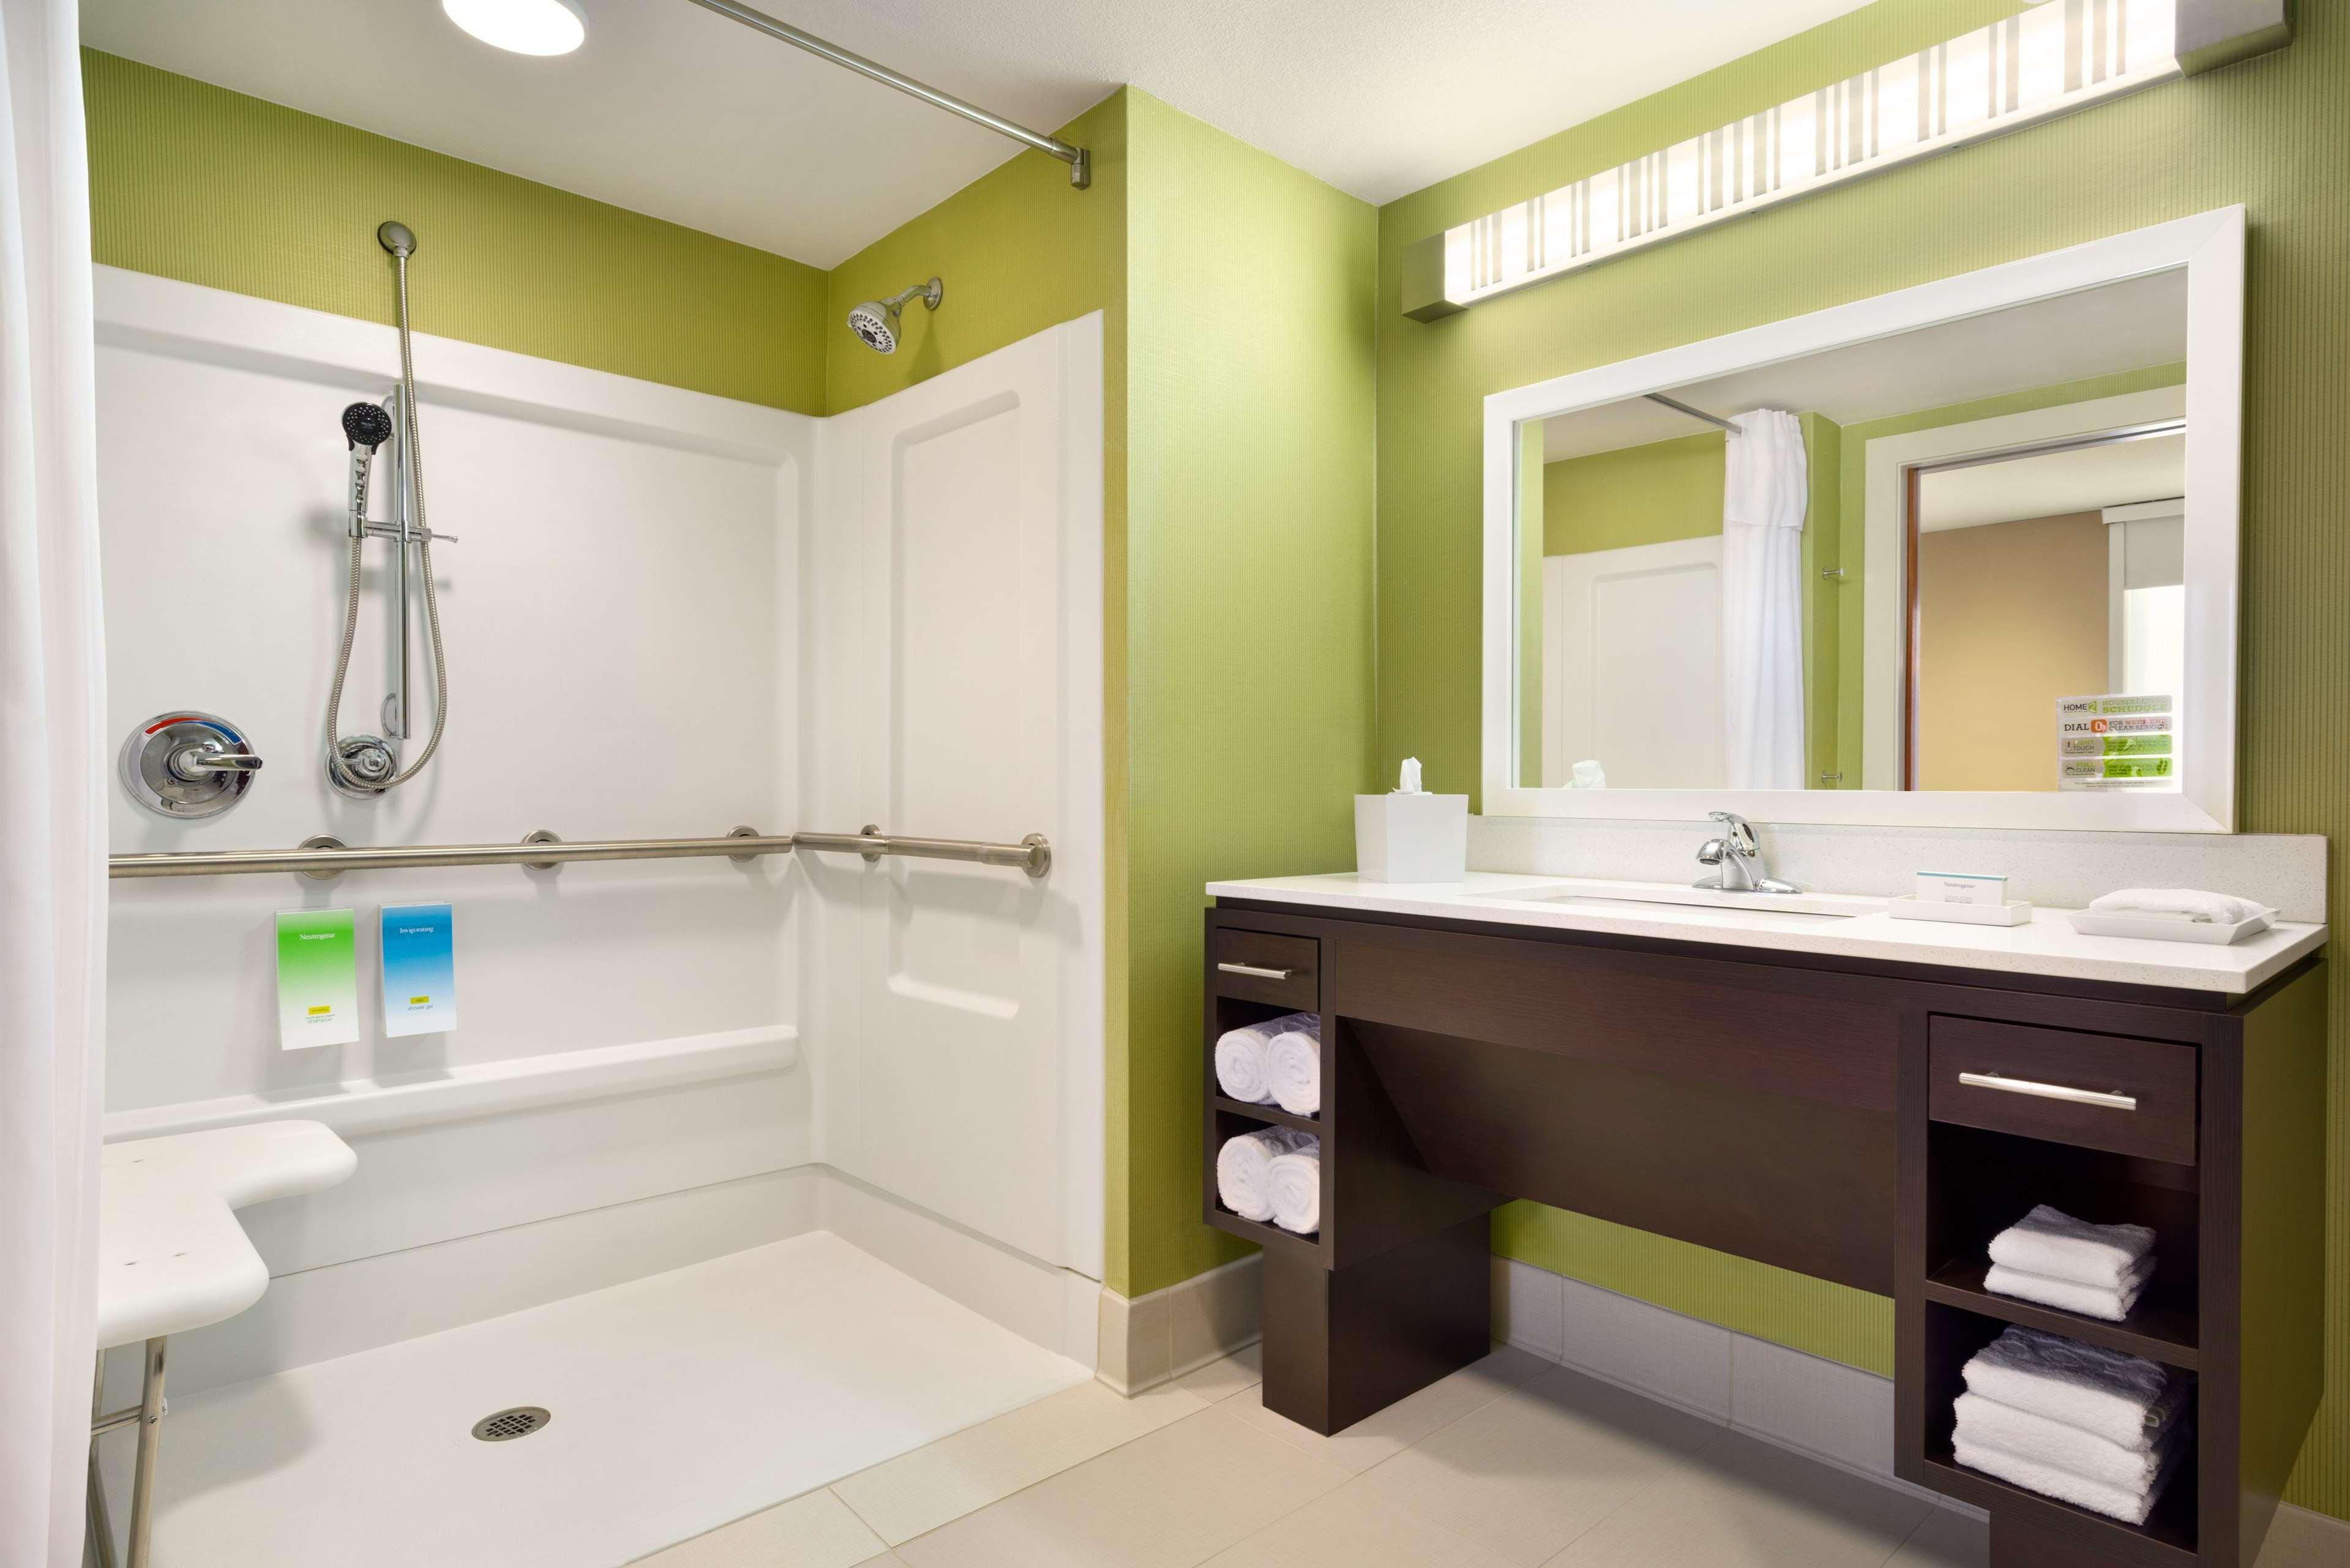 Home2 Suites by Hilton Leavenworth Downtown image 27